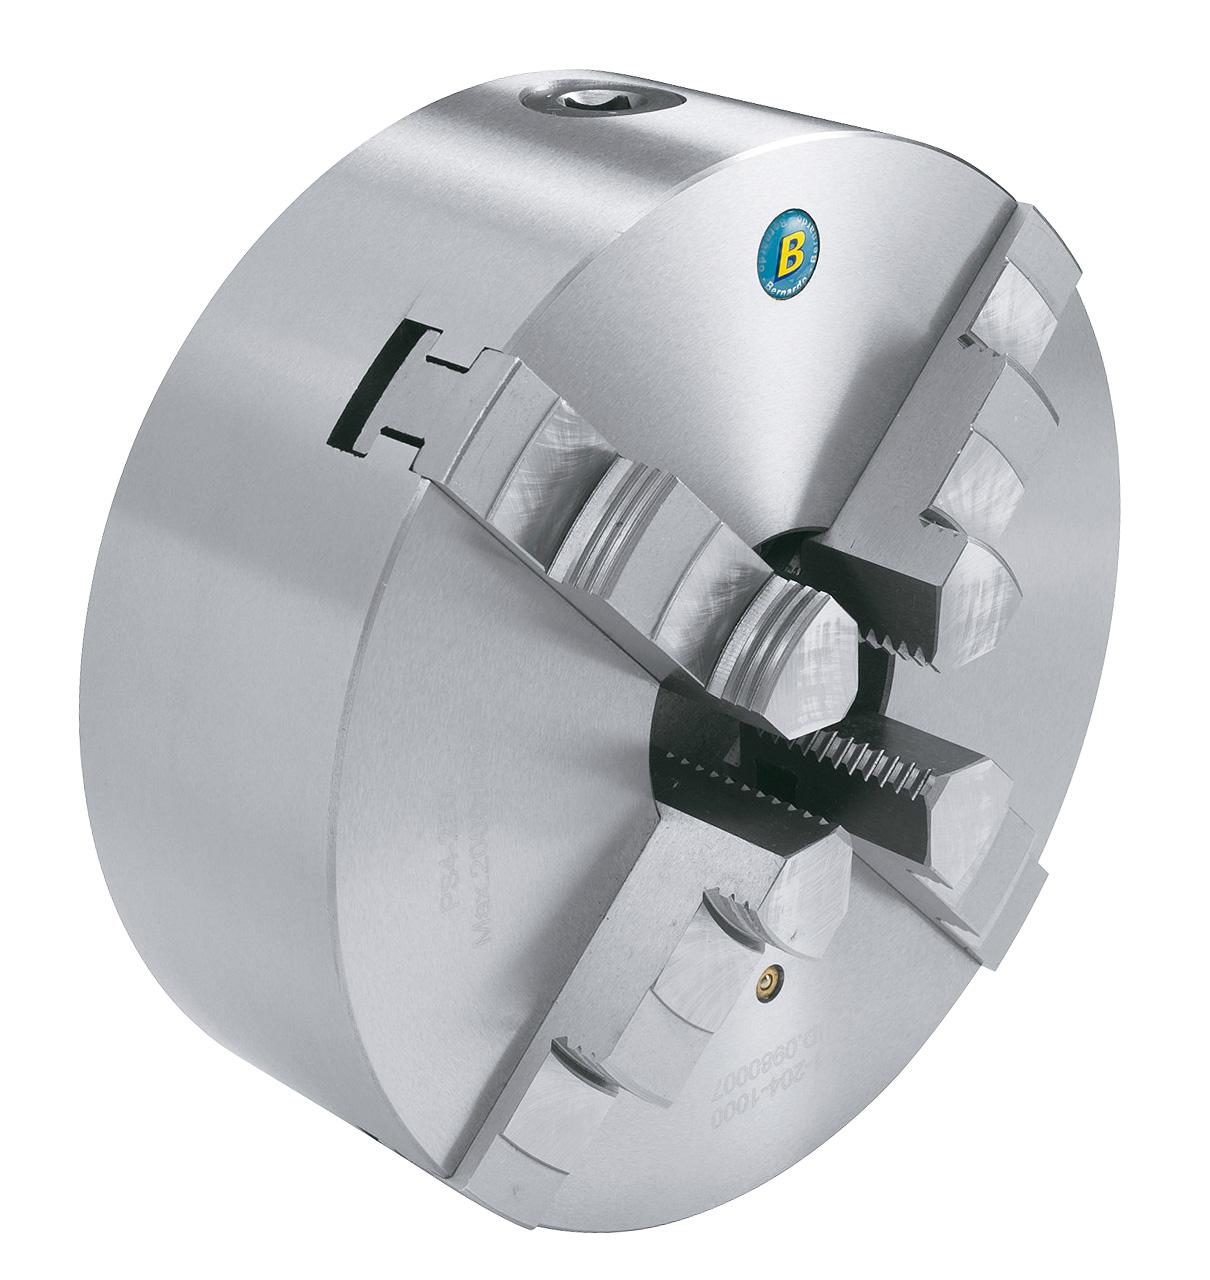 Standard-4-bakket centrerpatron DK12-100